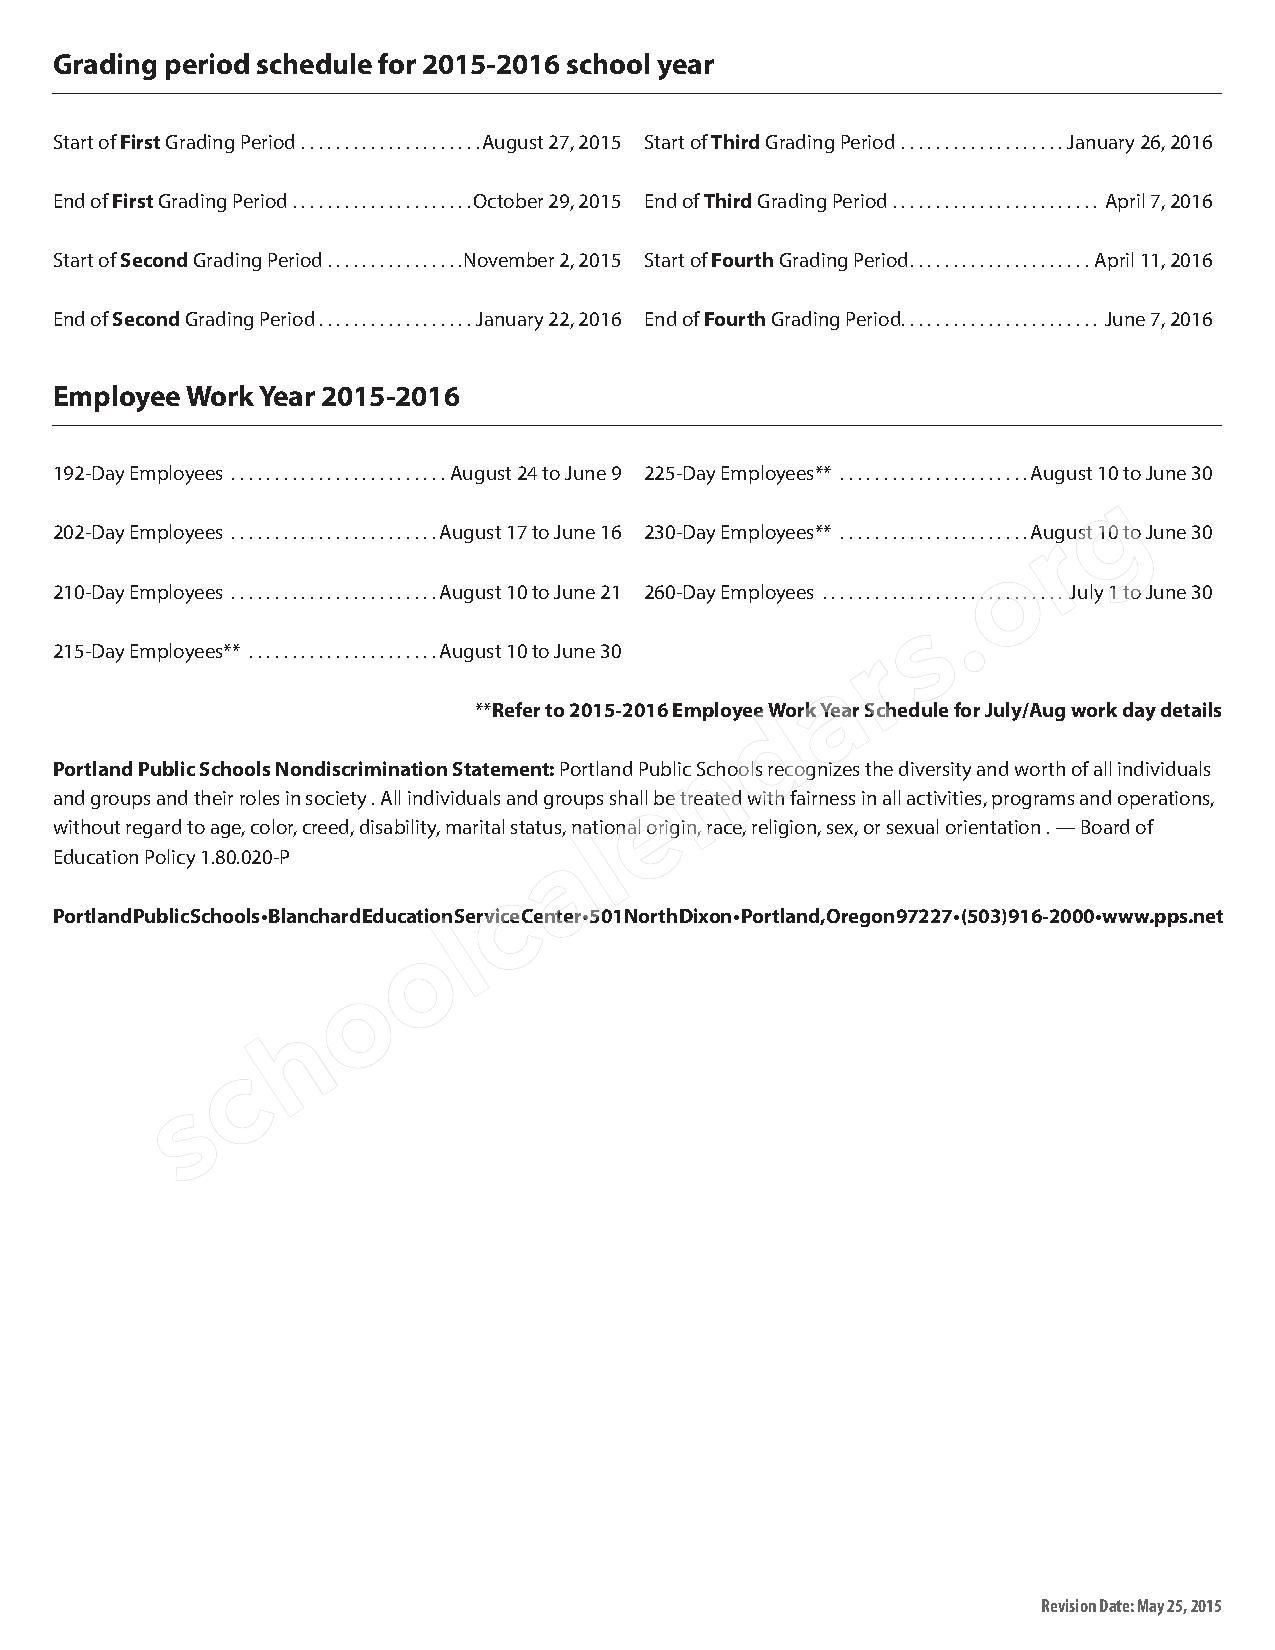 2015 - 2016 Quarter School Calendar – Portland Public Schools – page 2